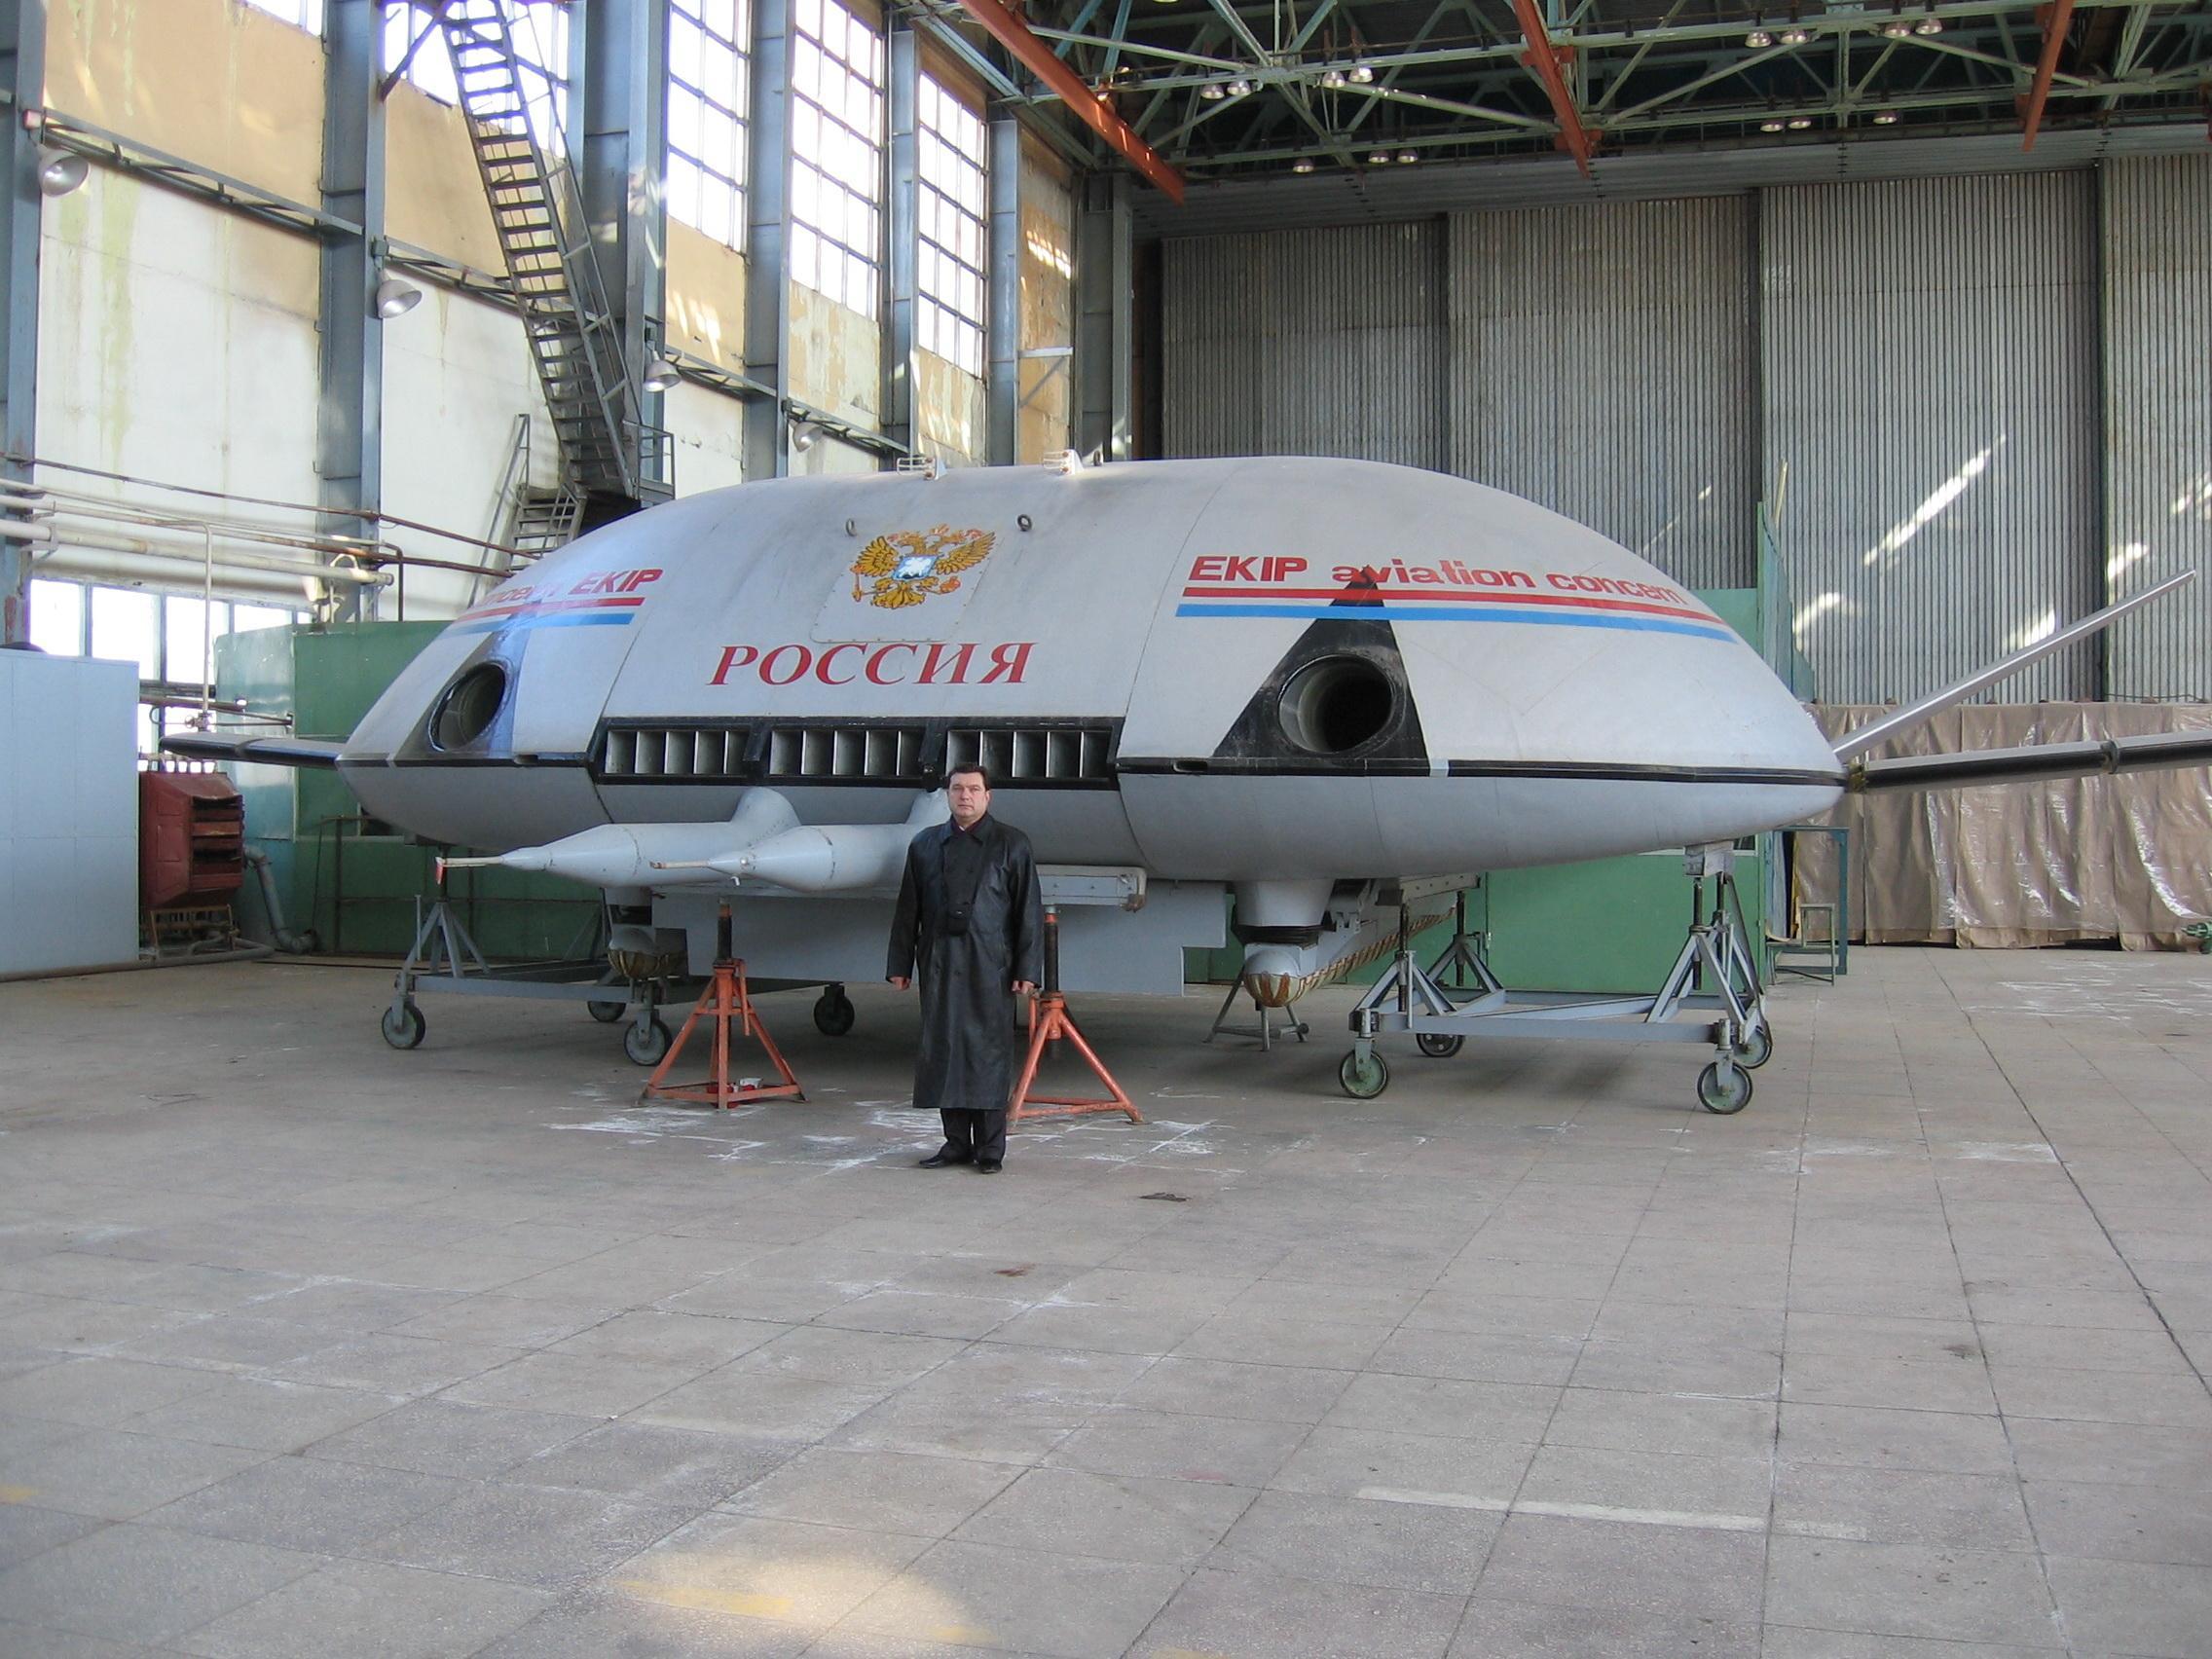 http://nfir.ucoz.ru/imag/Novonochinod_AA2.jpg